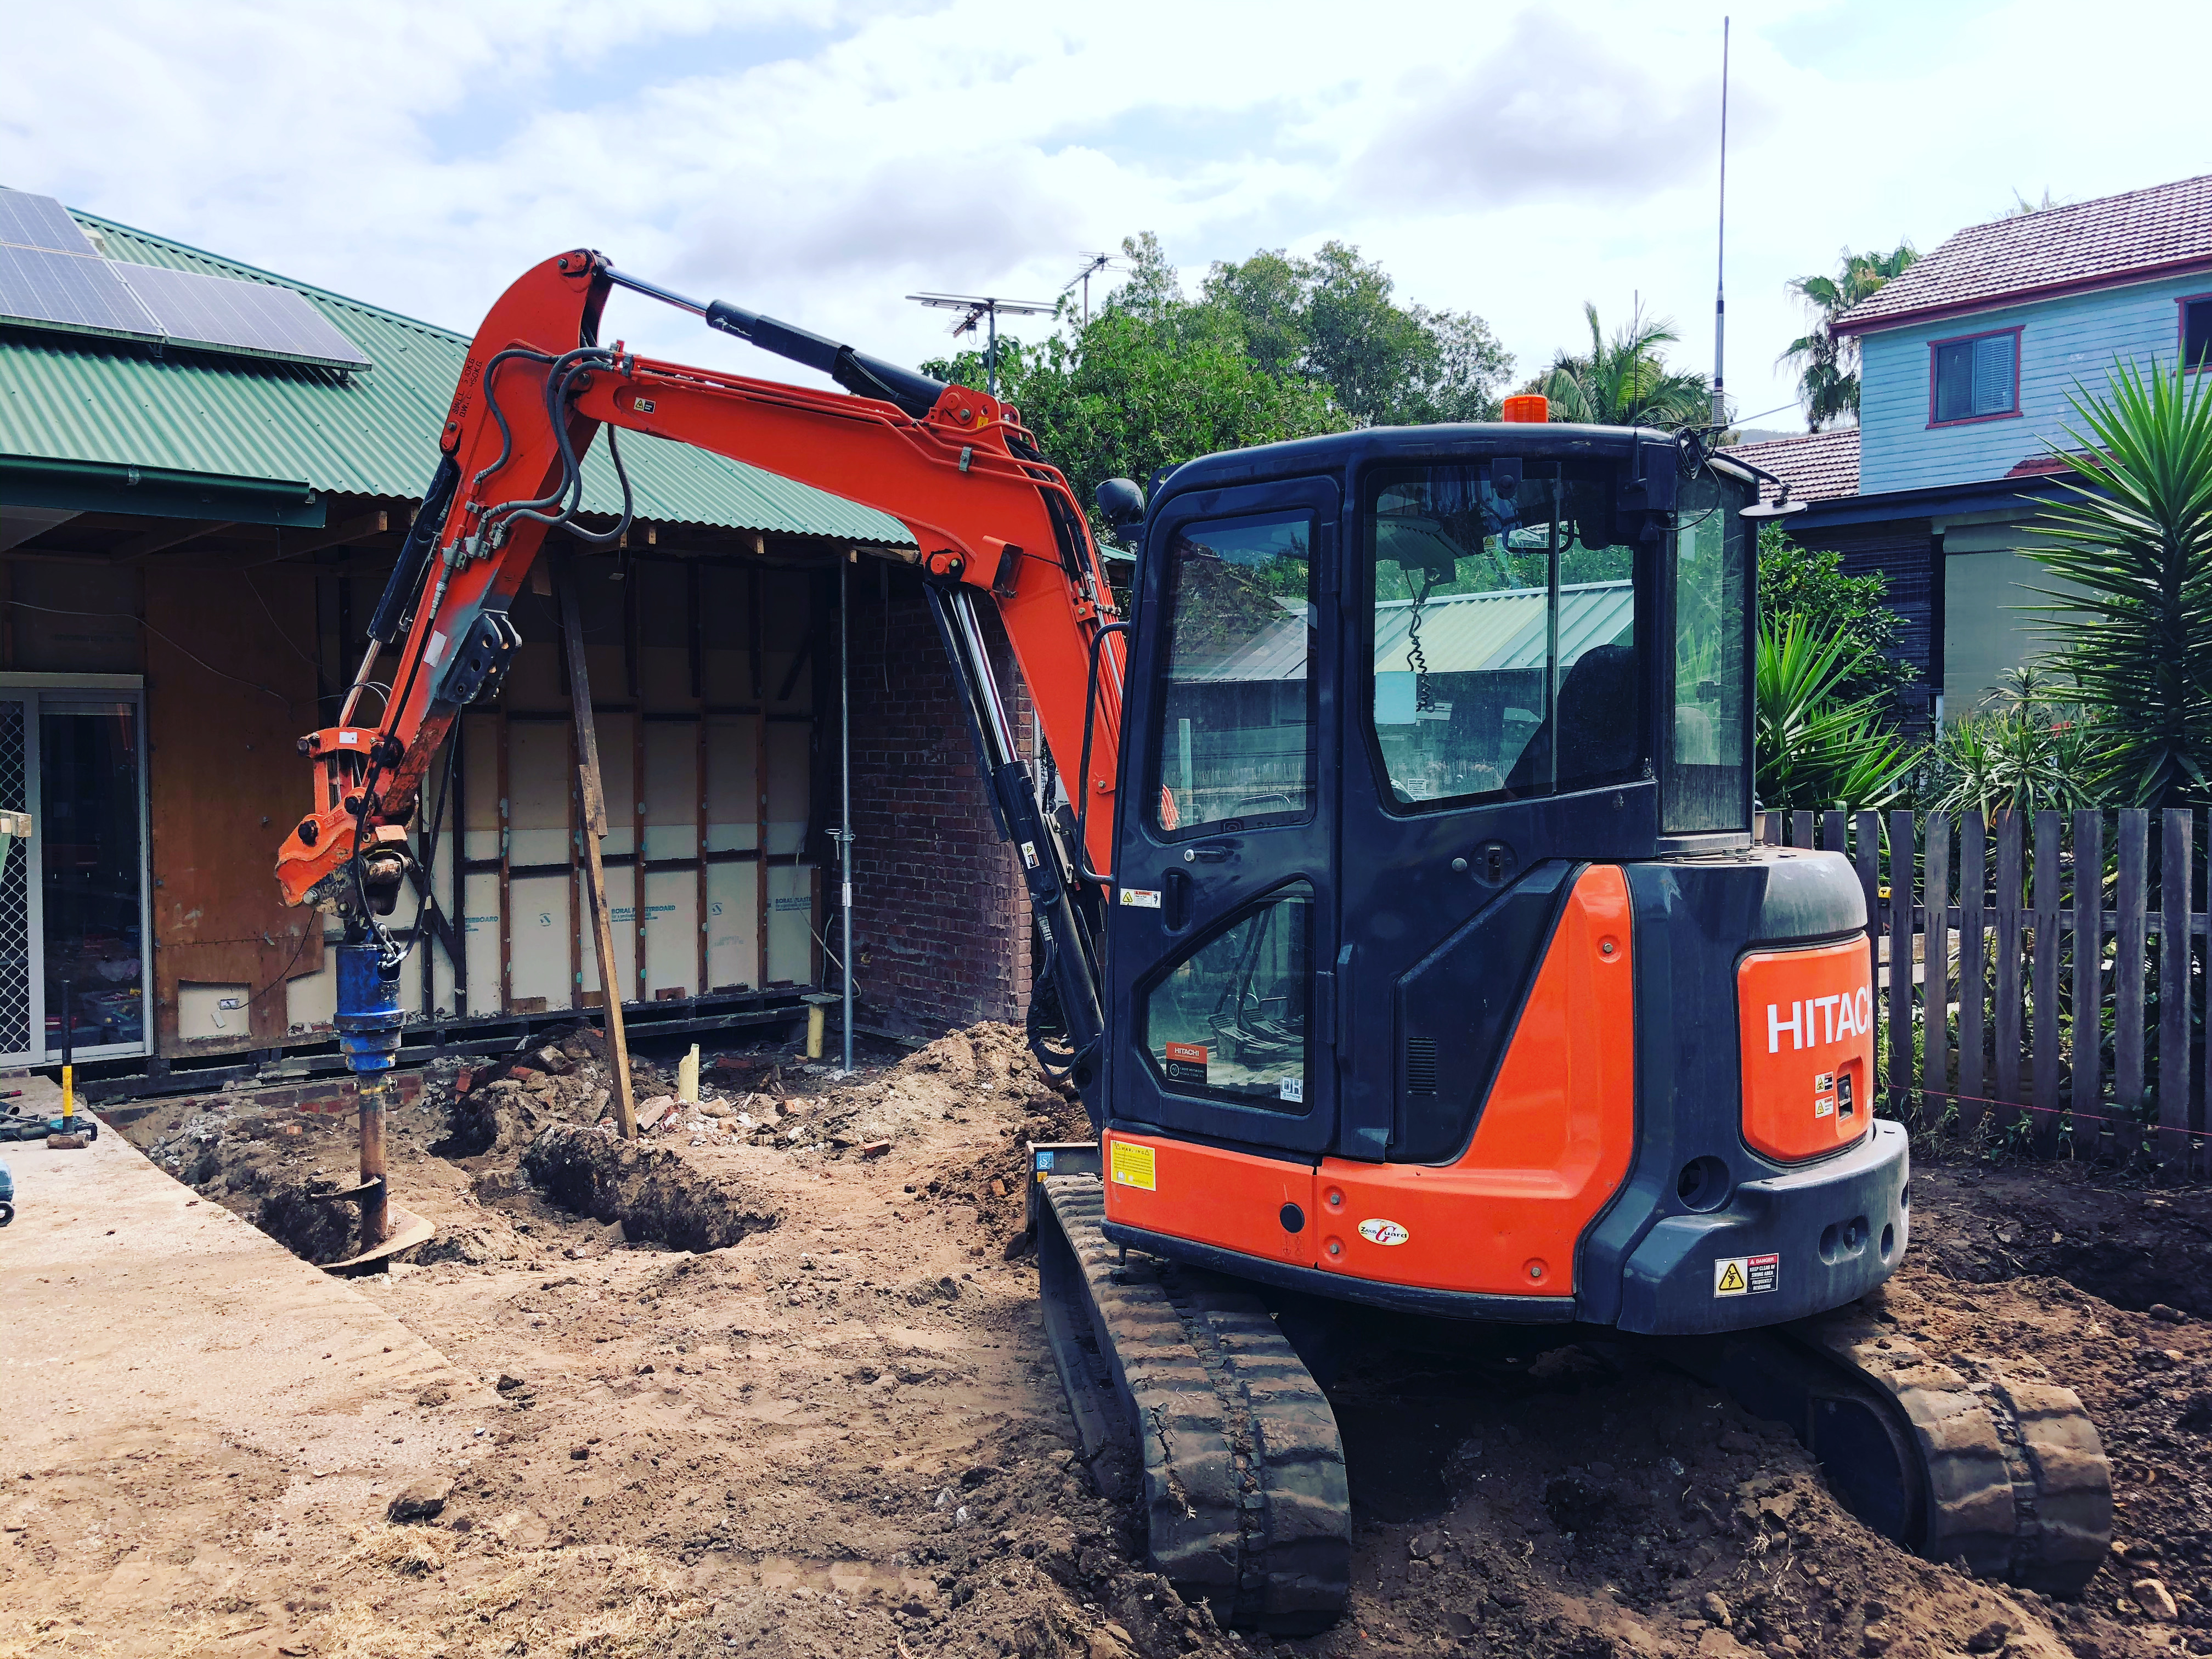 Excavator Peir Holes Auger